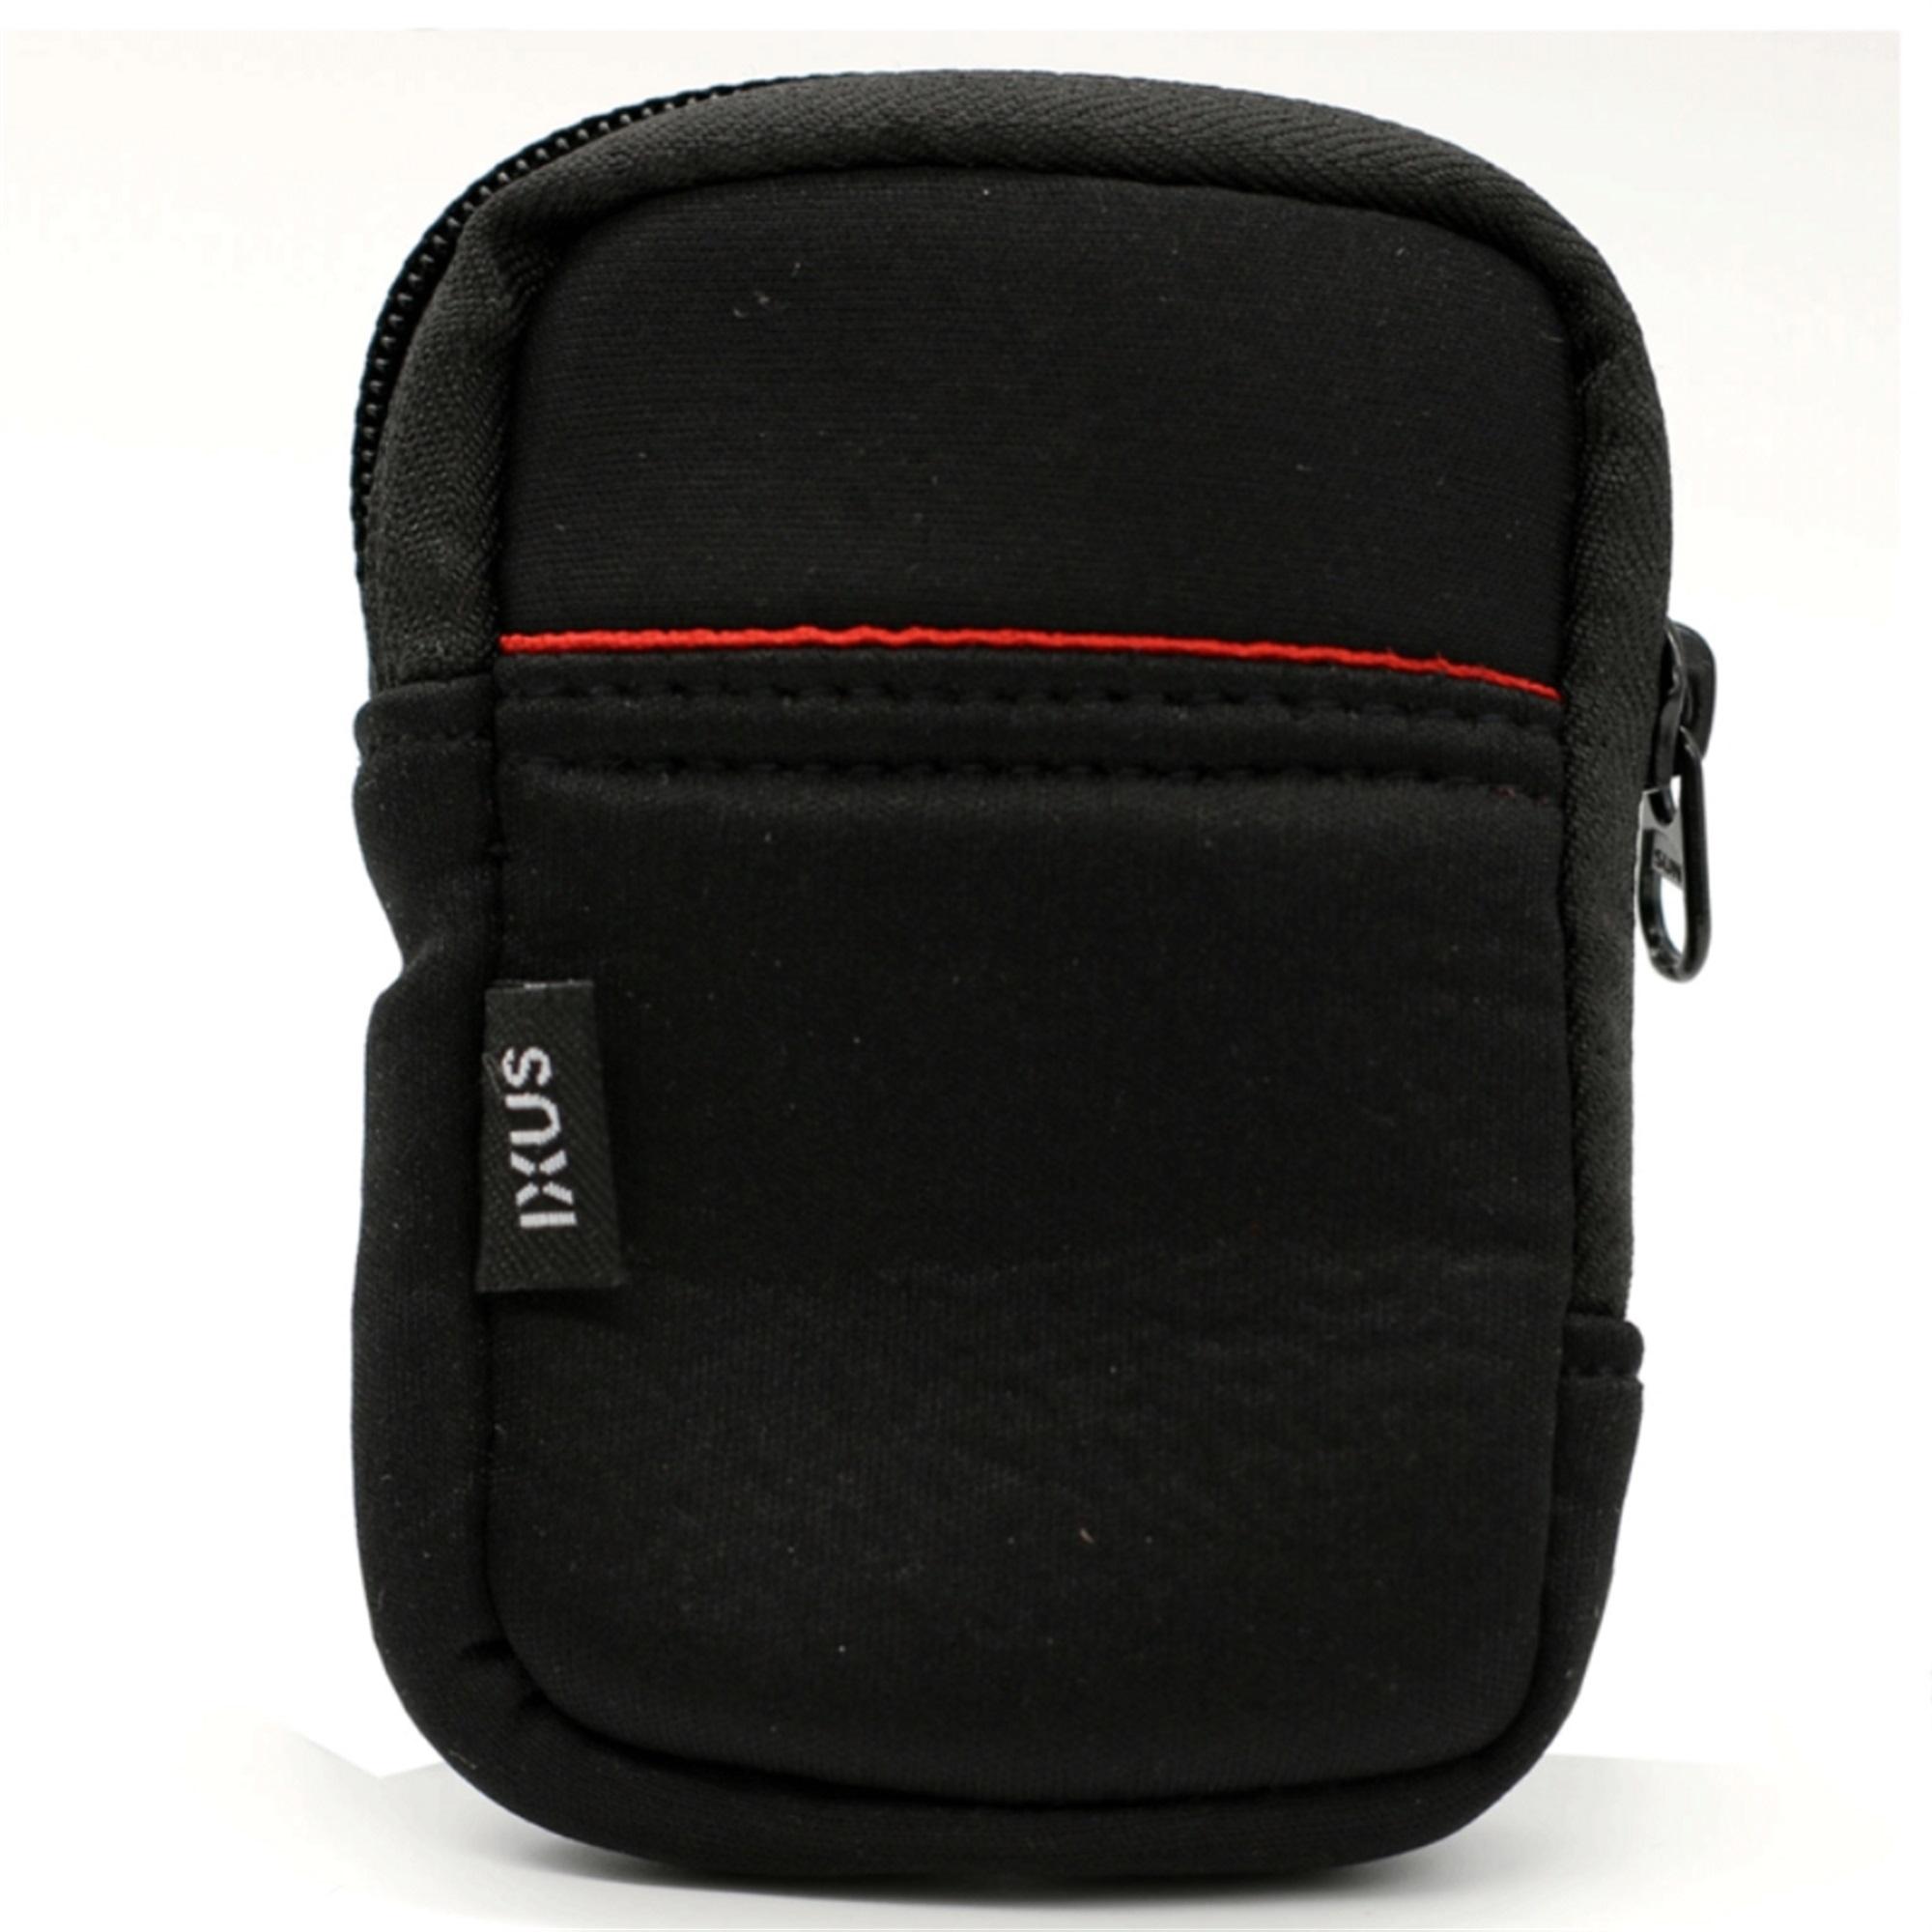 Sony Cyber-Shot DSC-W800 20.1MP Digital Camera Black with Great Value Kit